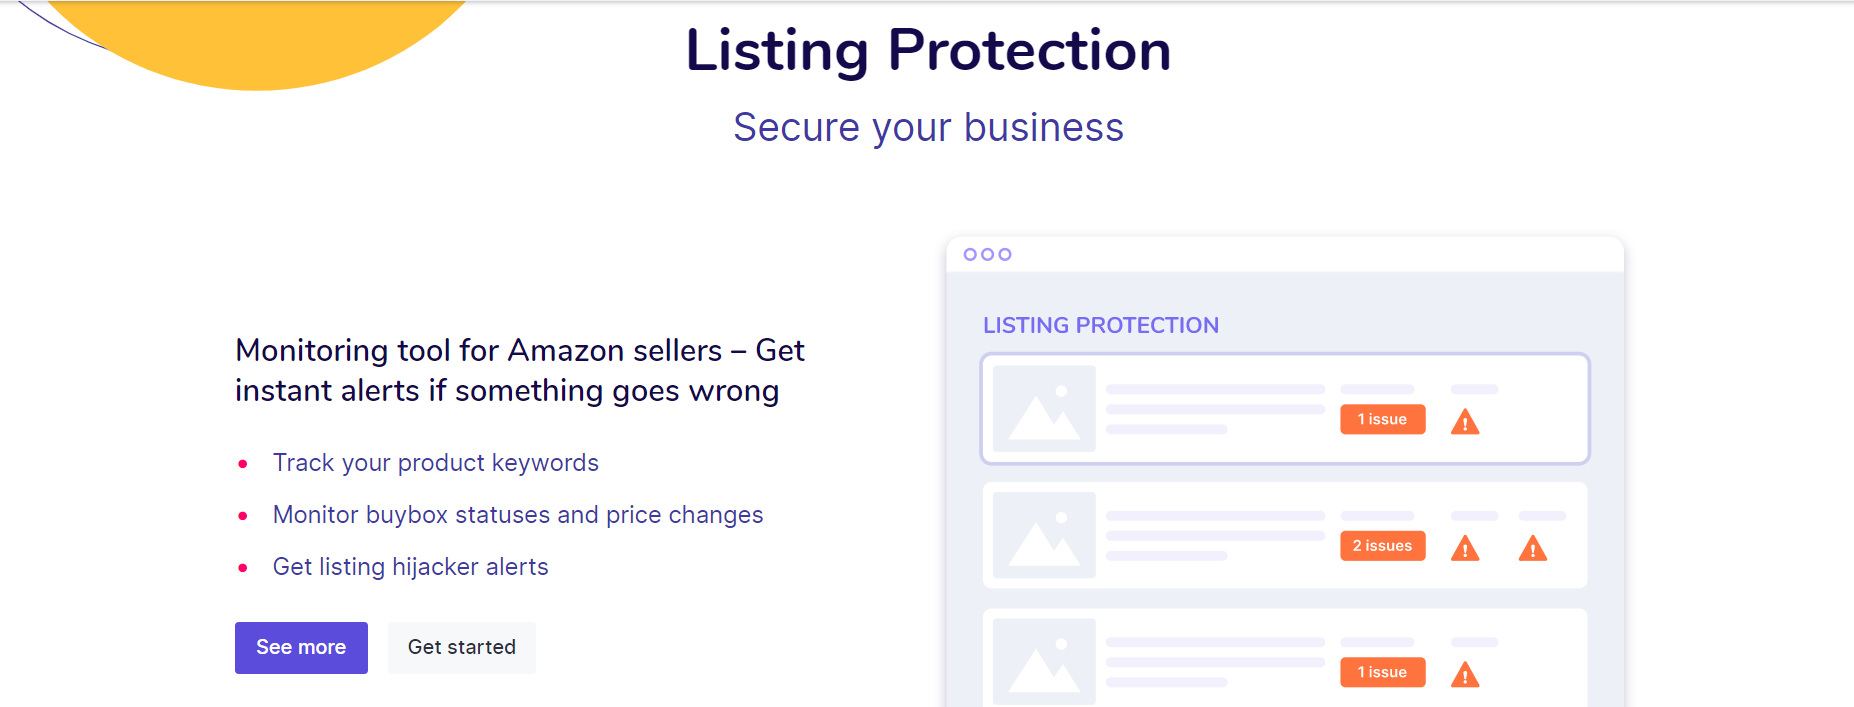 Listing Protection